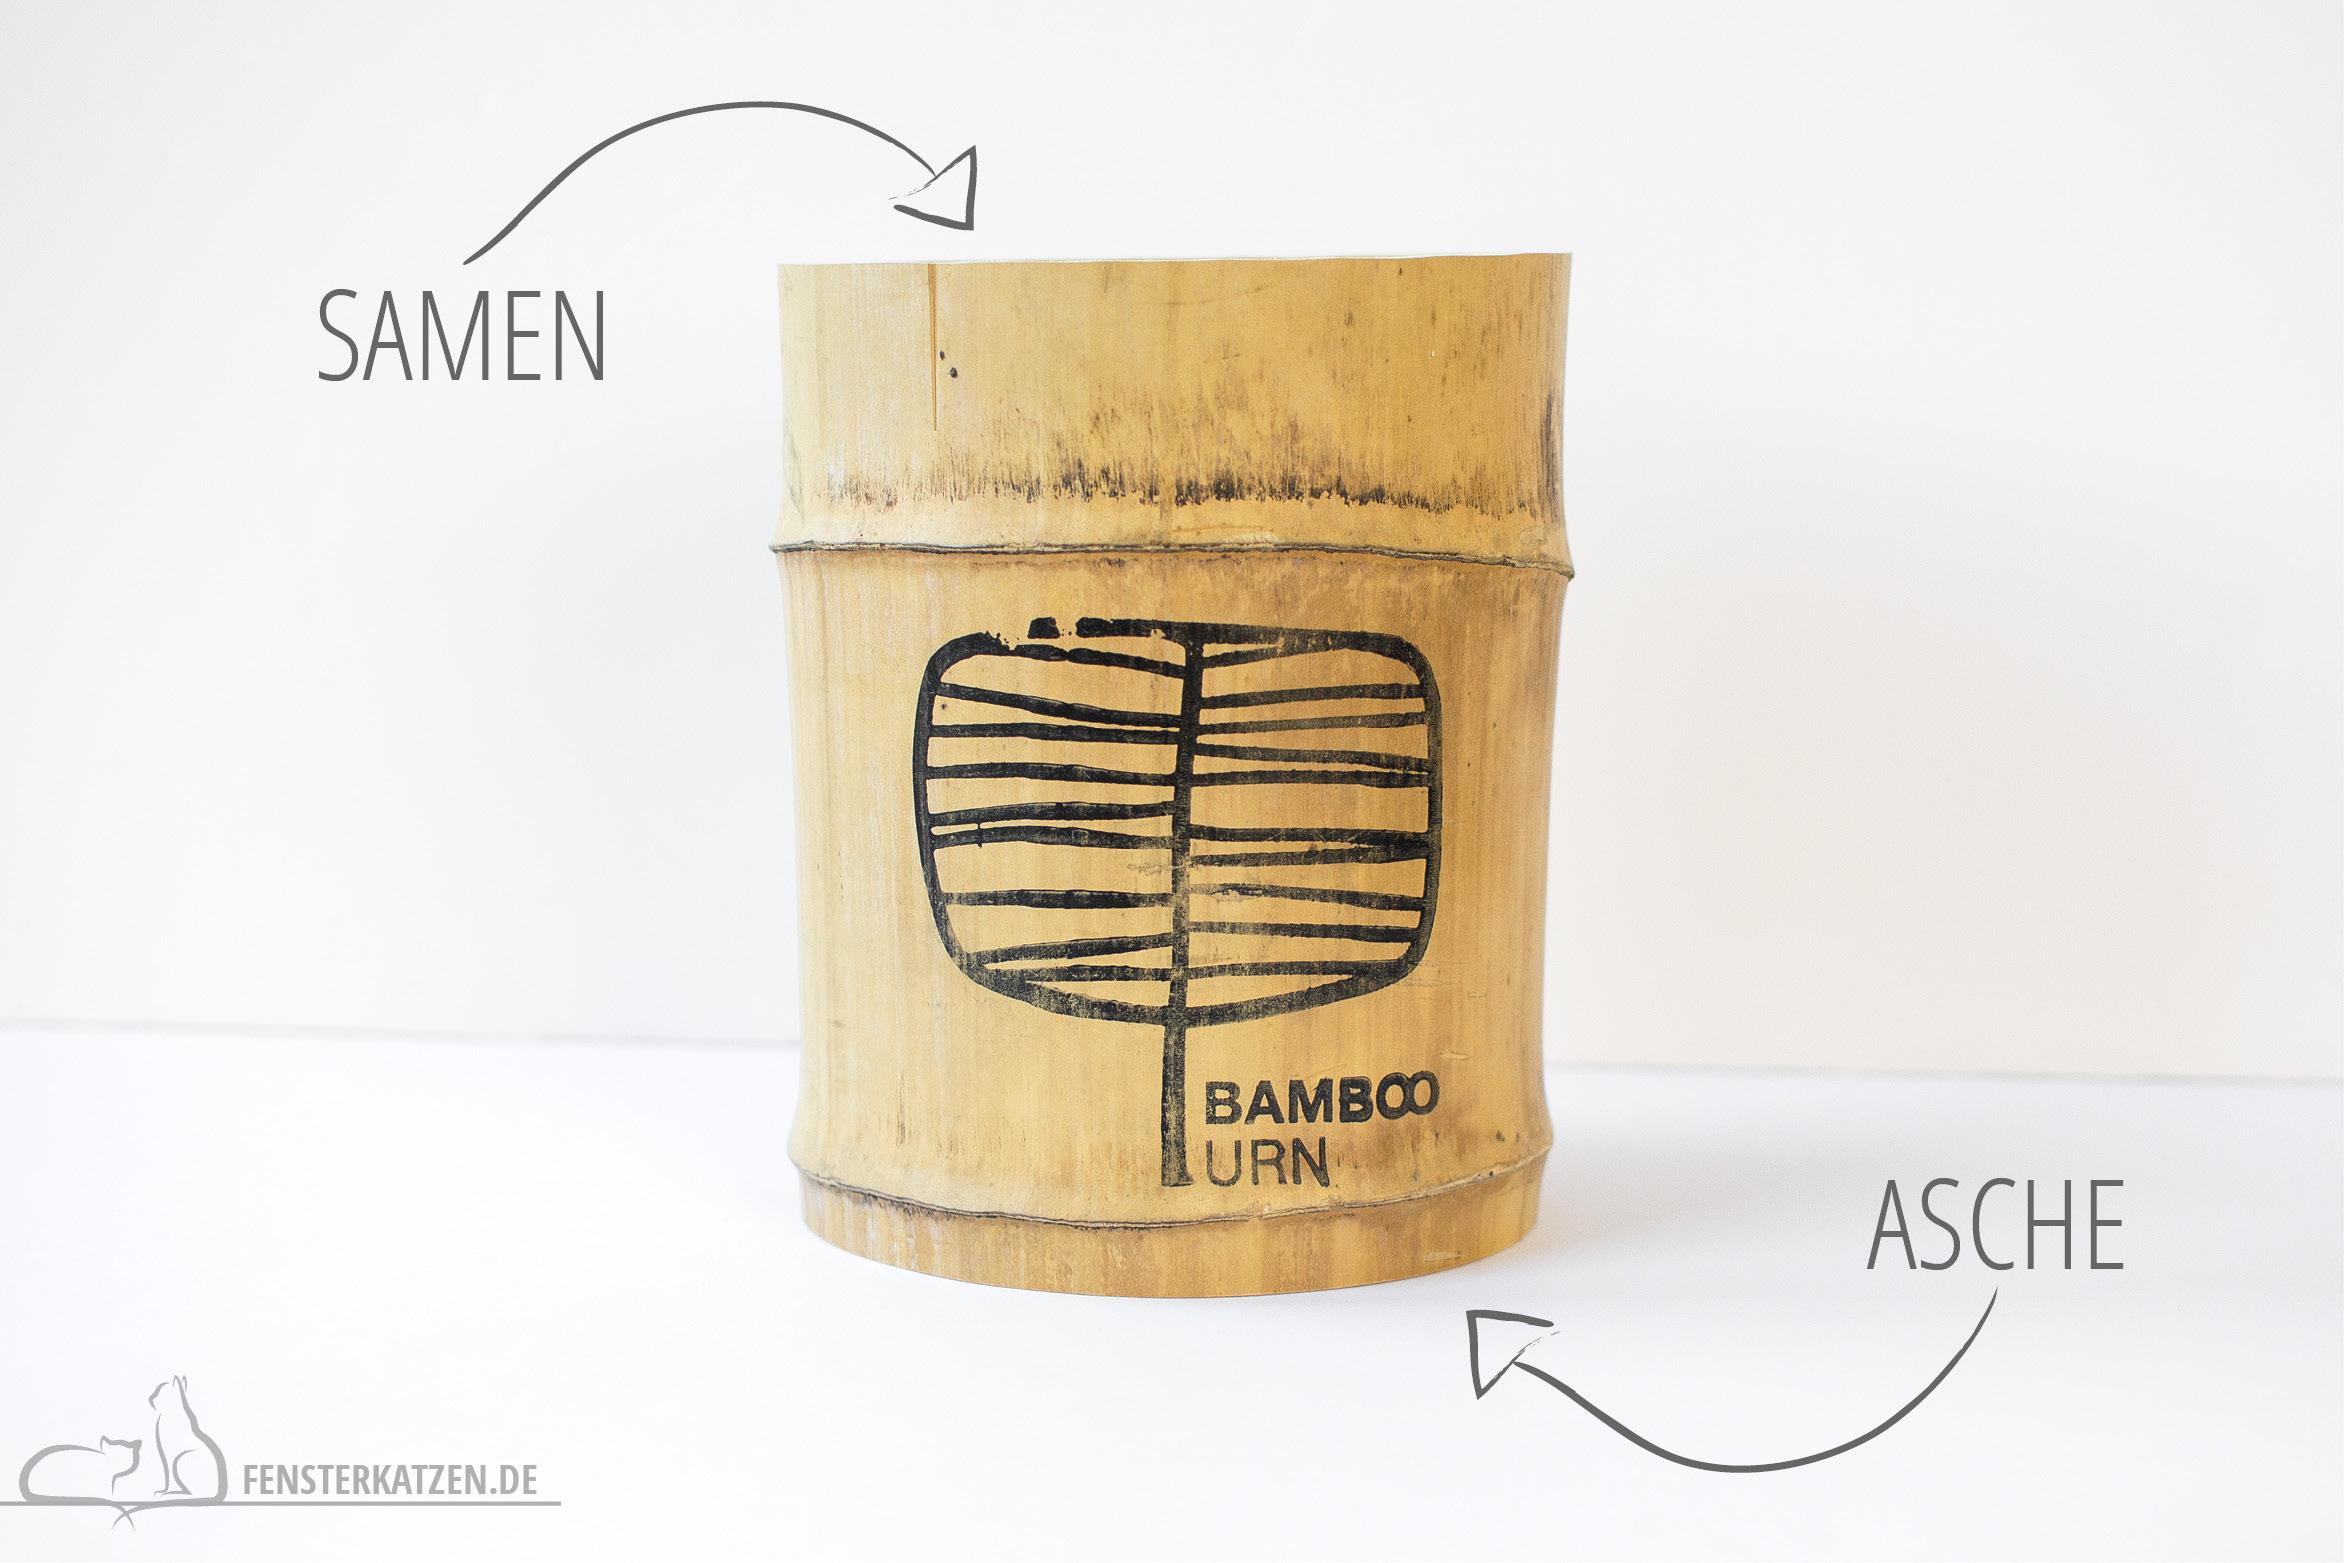 Fensterkatzen-Ratgeber-Katze-stirbt-Bamboo-Urn-Anleitung